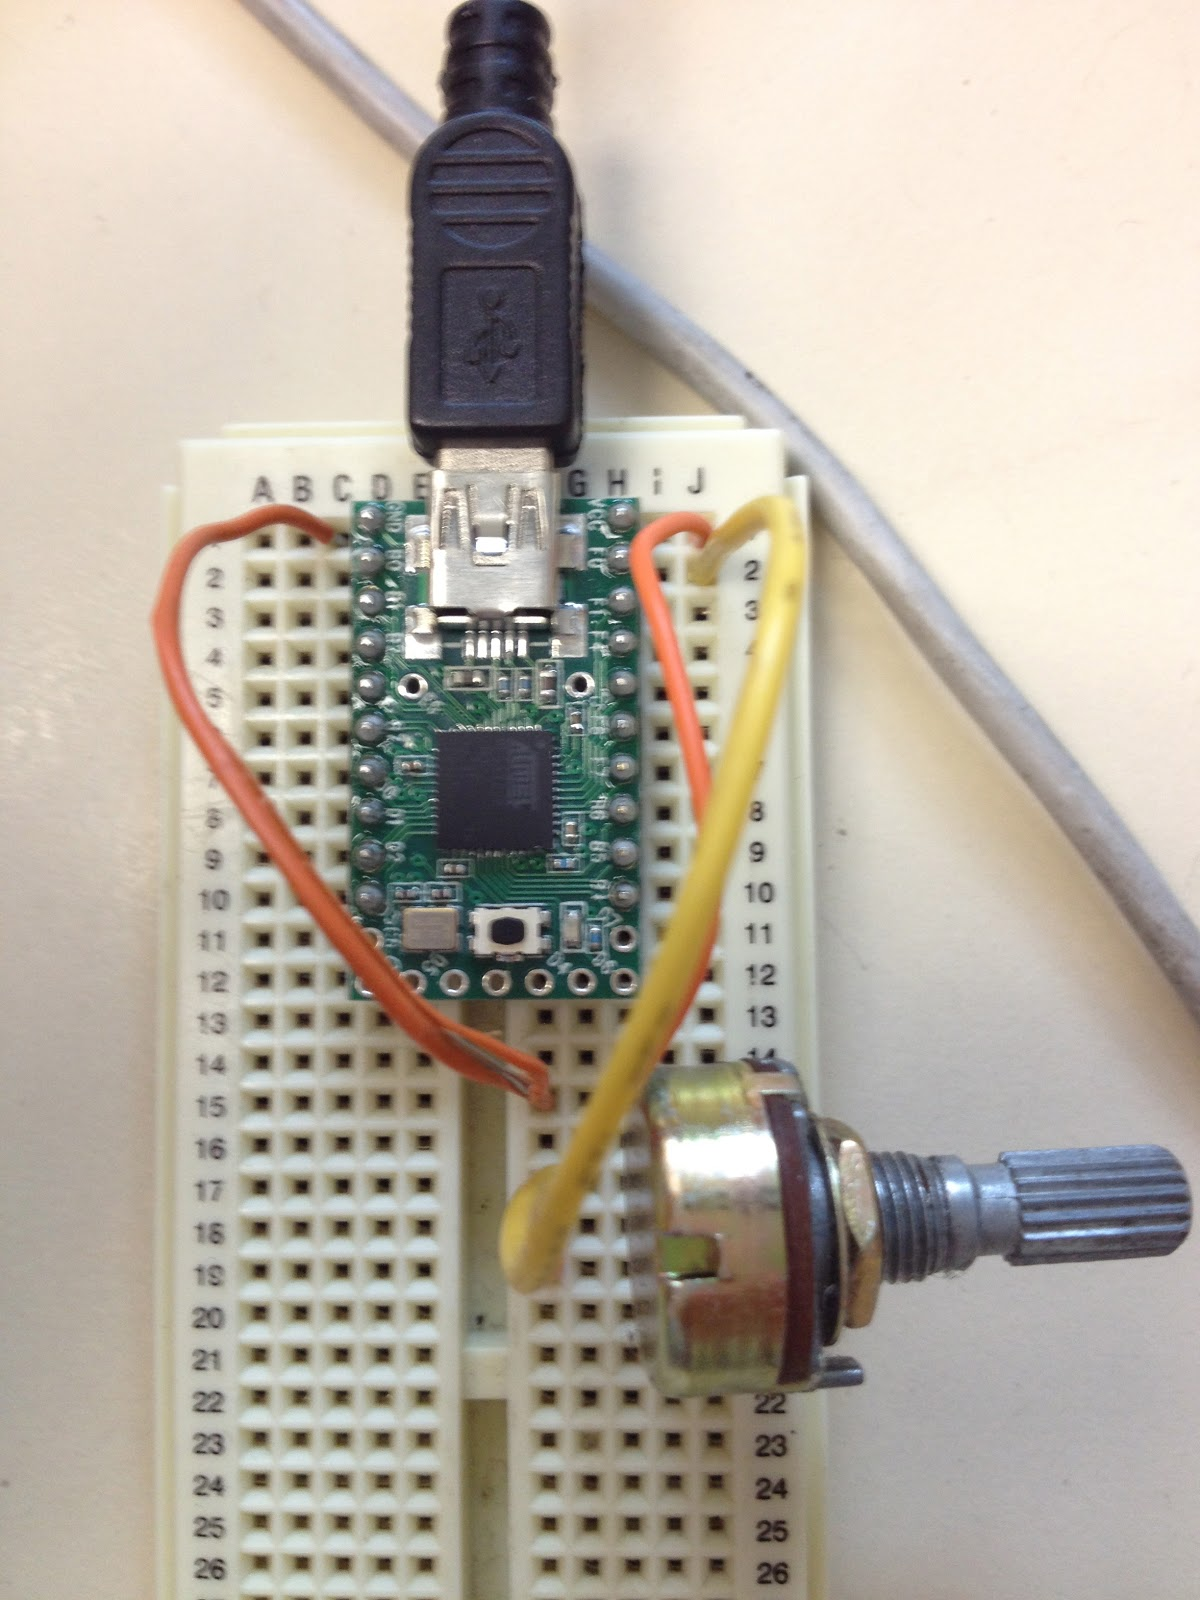 Midi To Usb Circuit Diagram - ( Simple Electronic Circuits ) •